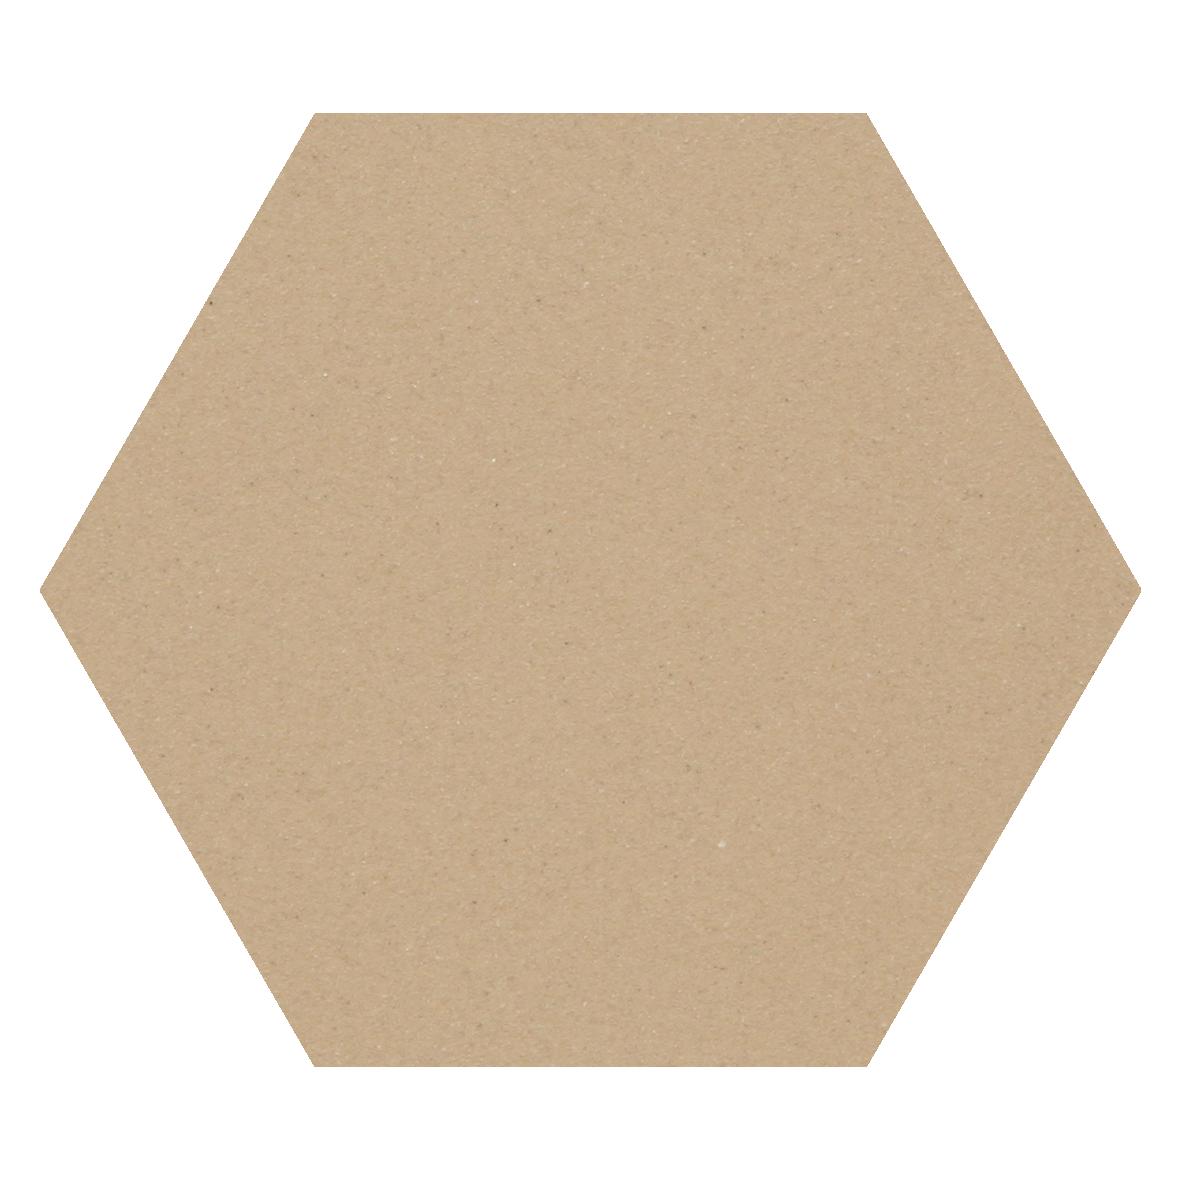 PNM360130, Natura, Beige, seina,lattia,pakkasenkesto,uimahalli,design_from_finland